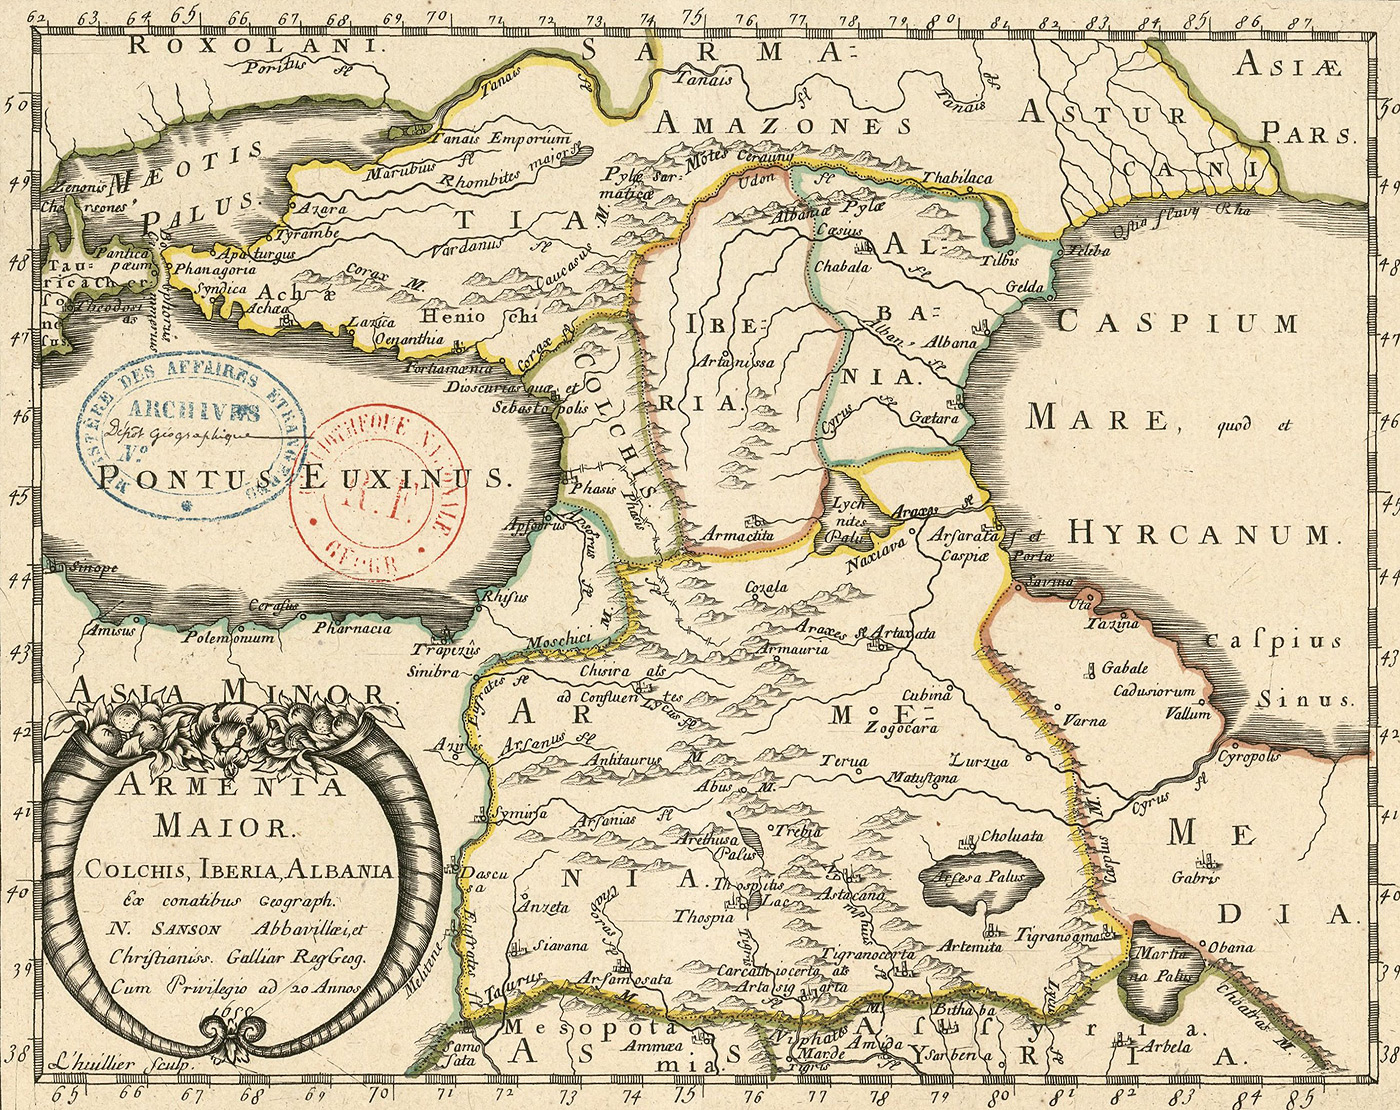 Map of Armenia Major, Colchis, Iberia, Albania 1655 - PeopleOfAr